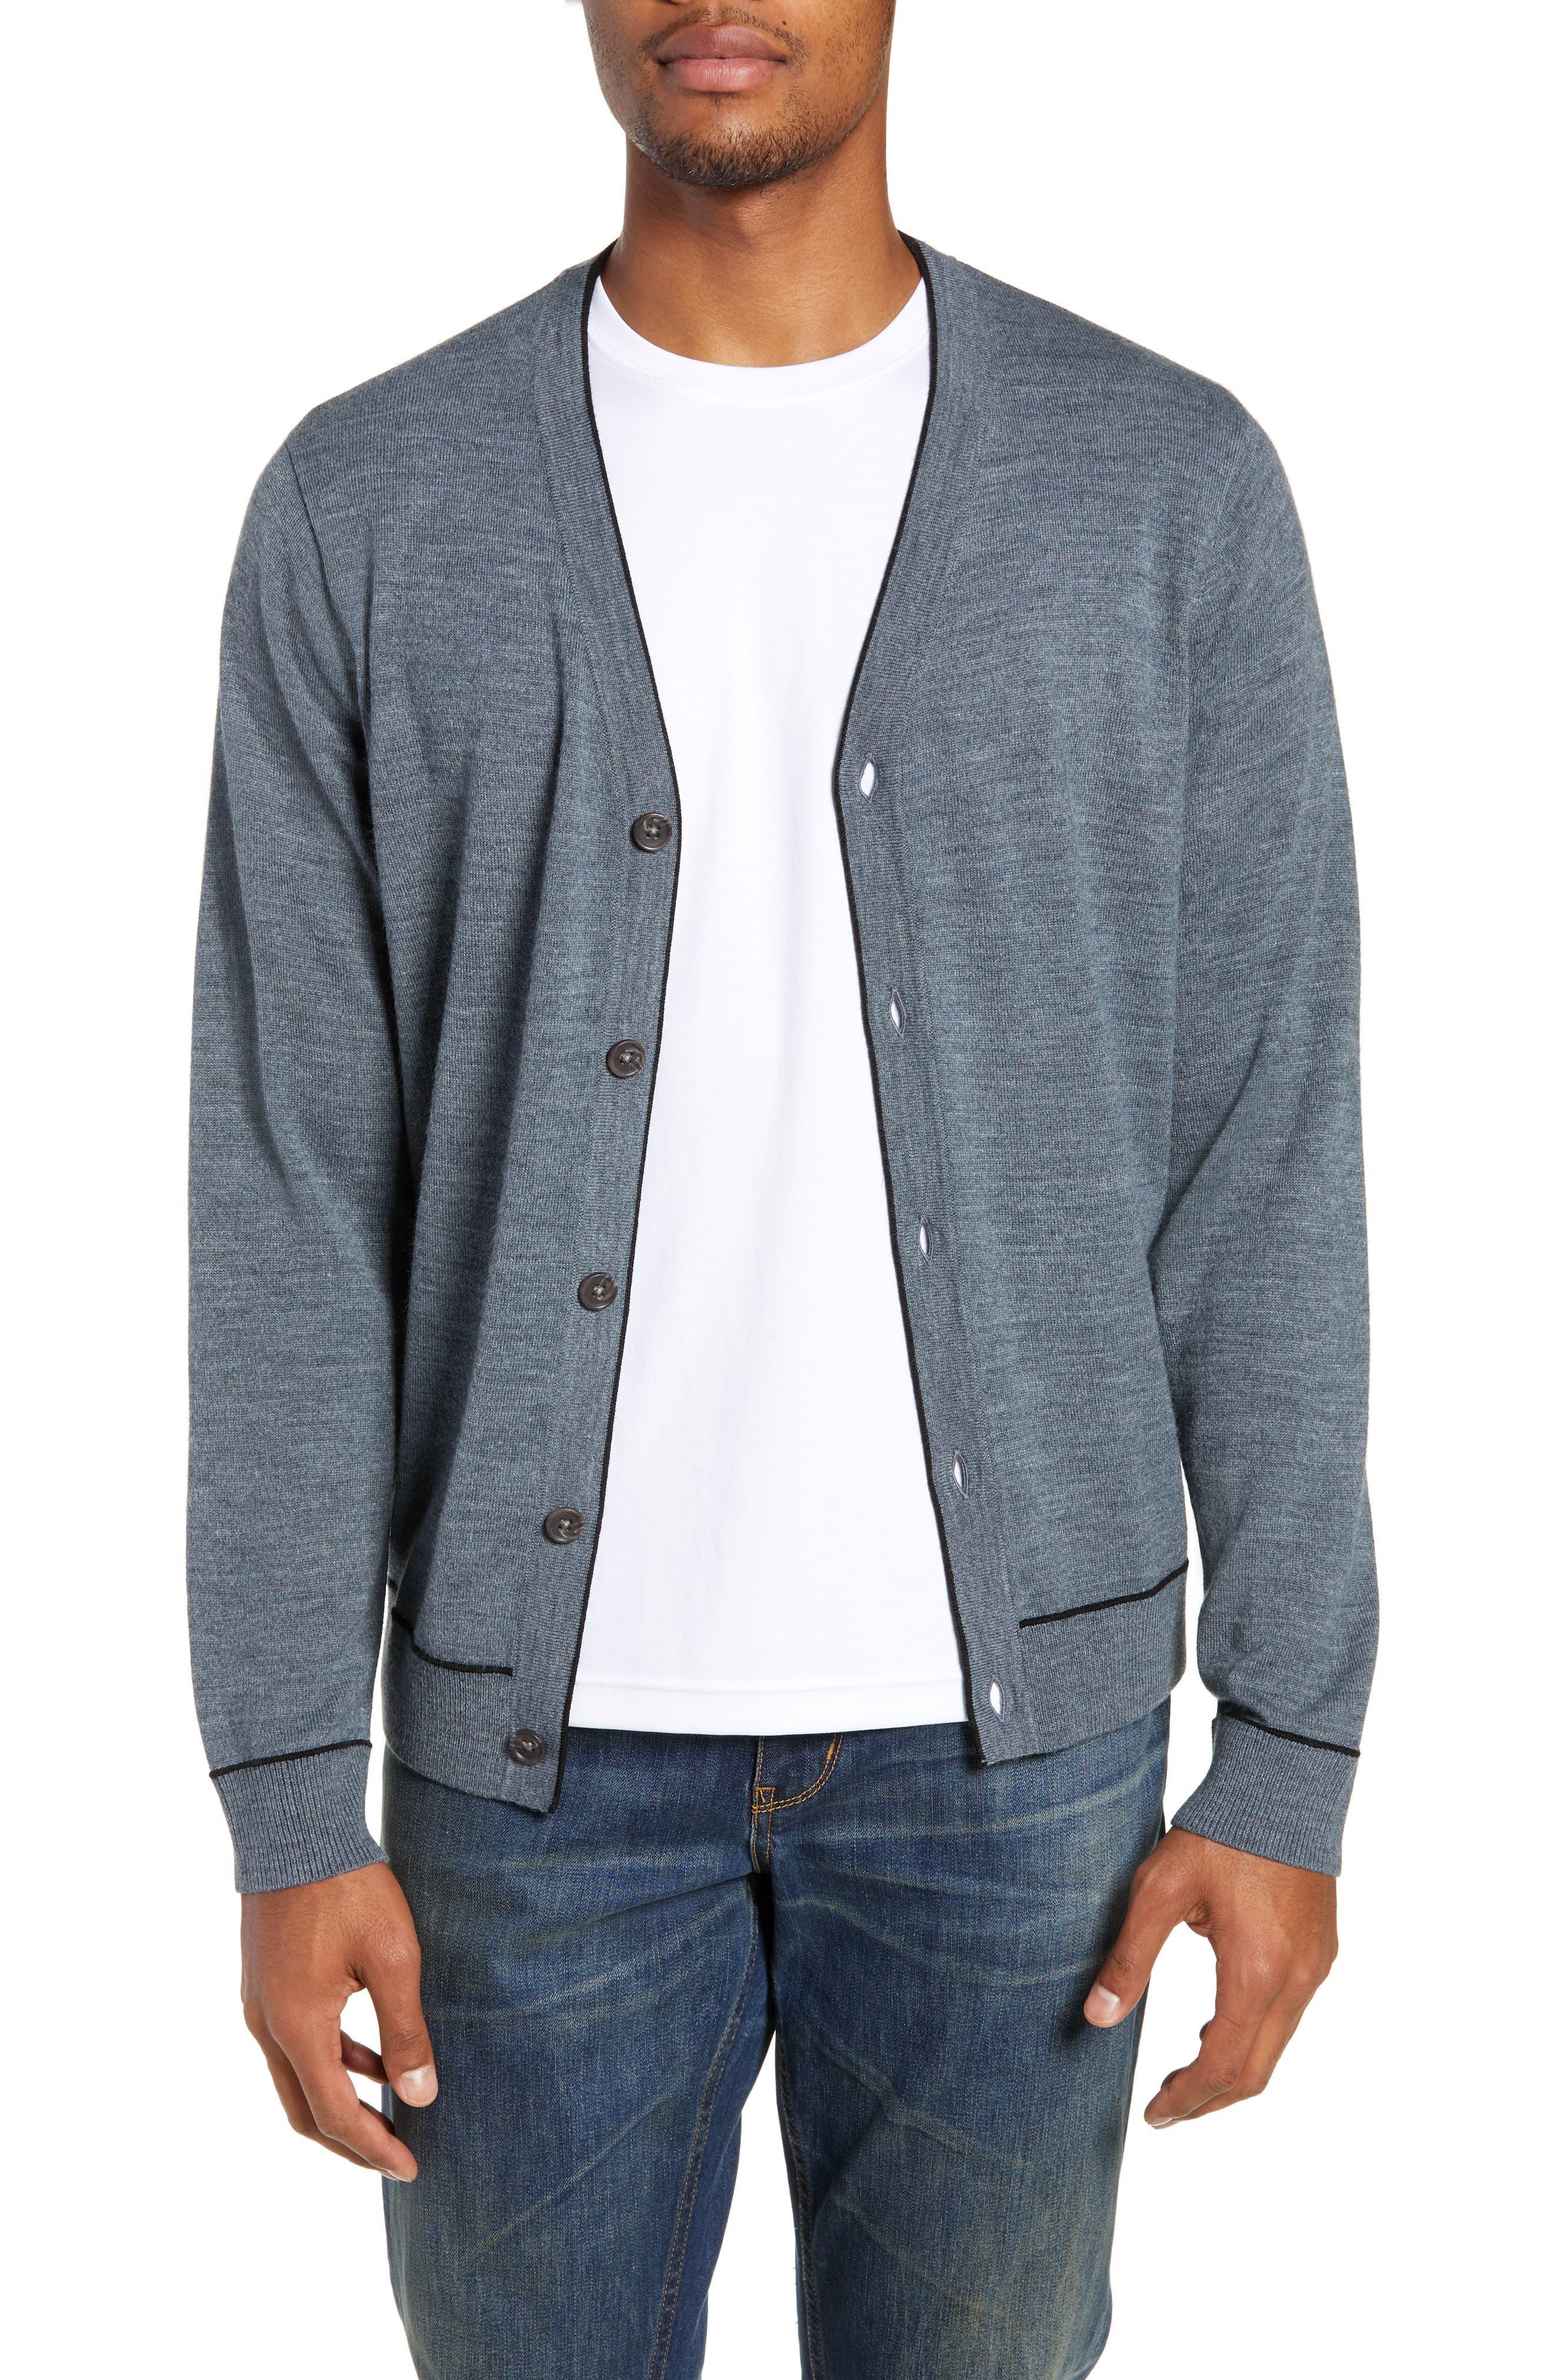 Nordstrom Shop Regular Fit Tipped Cardigan, Grey